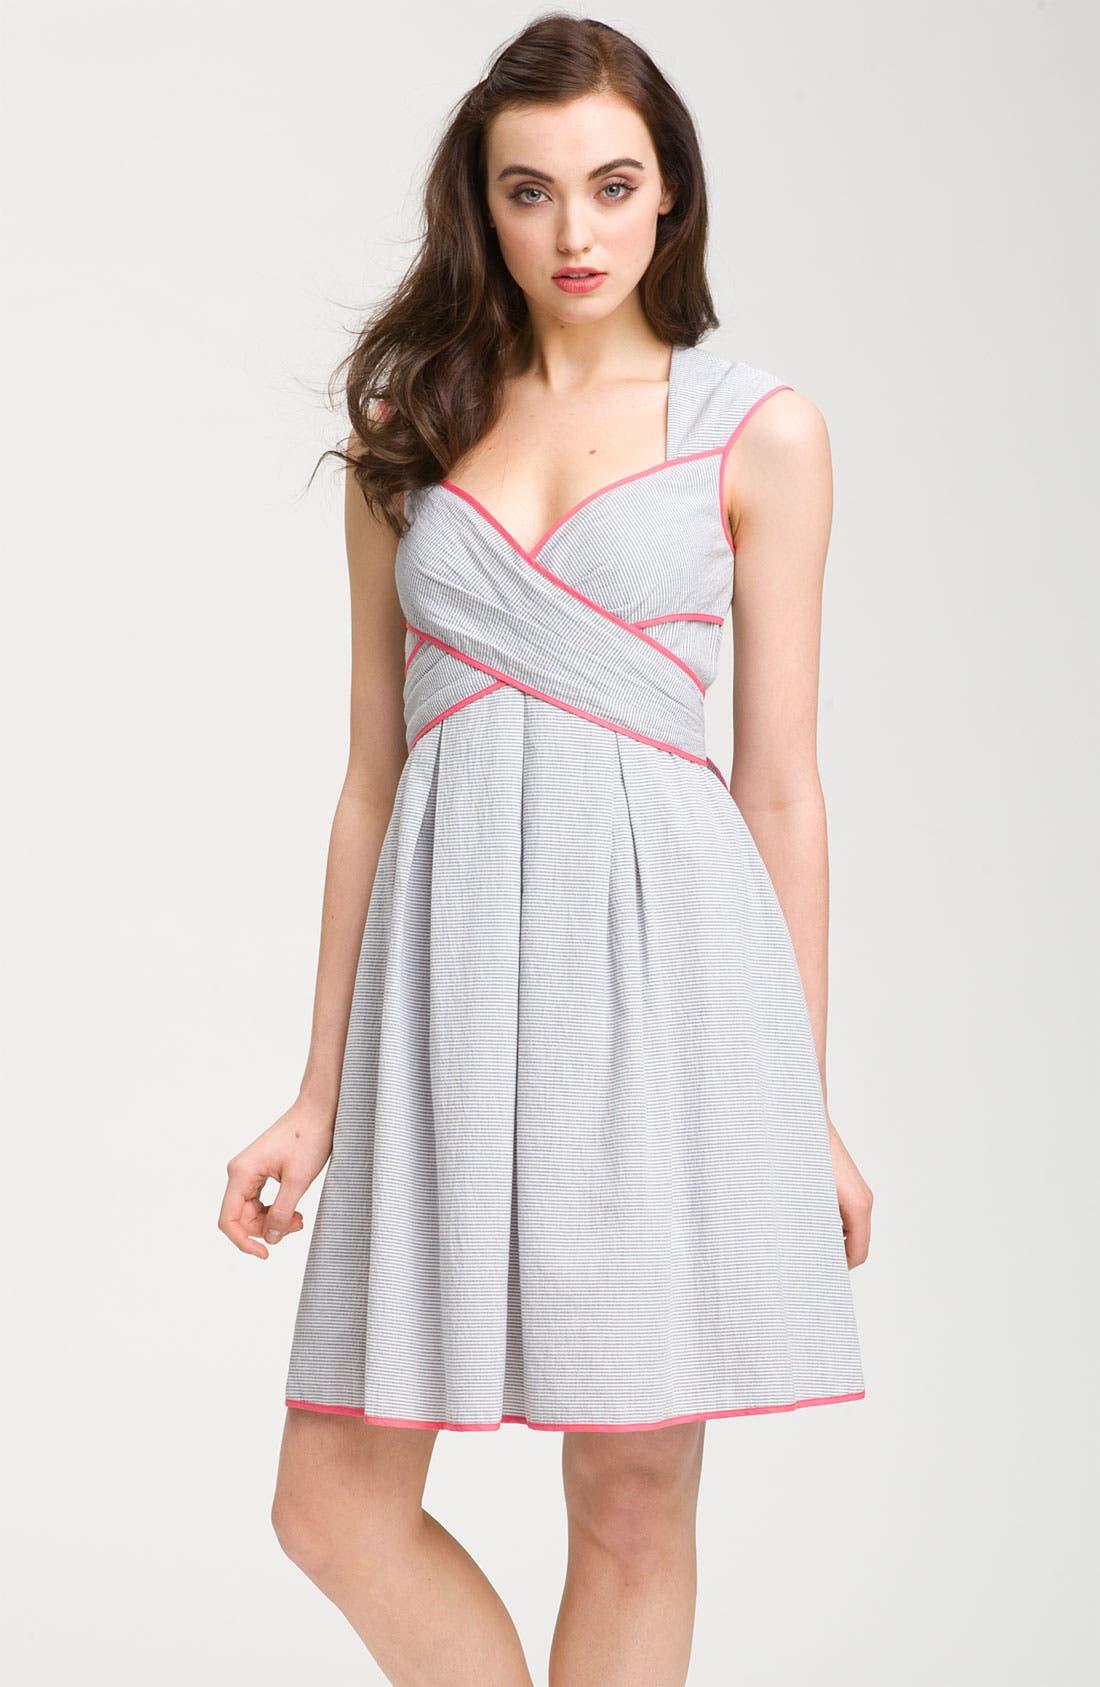 Alternate Image 1 Selected - Jessica Simpson Seersucker Cotton Sundress